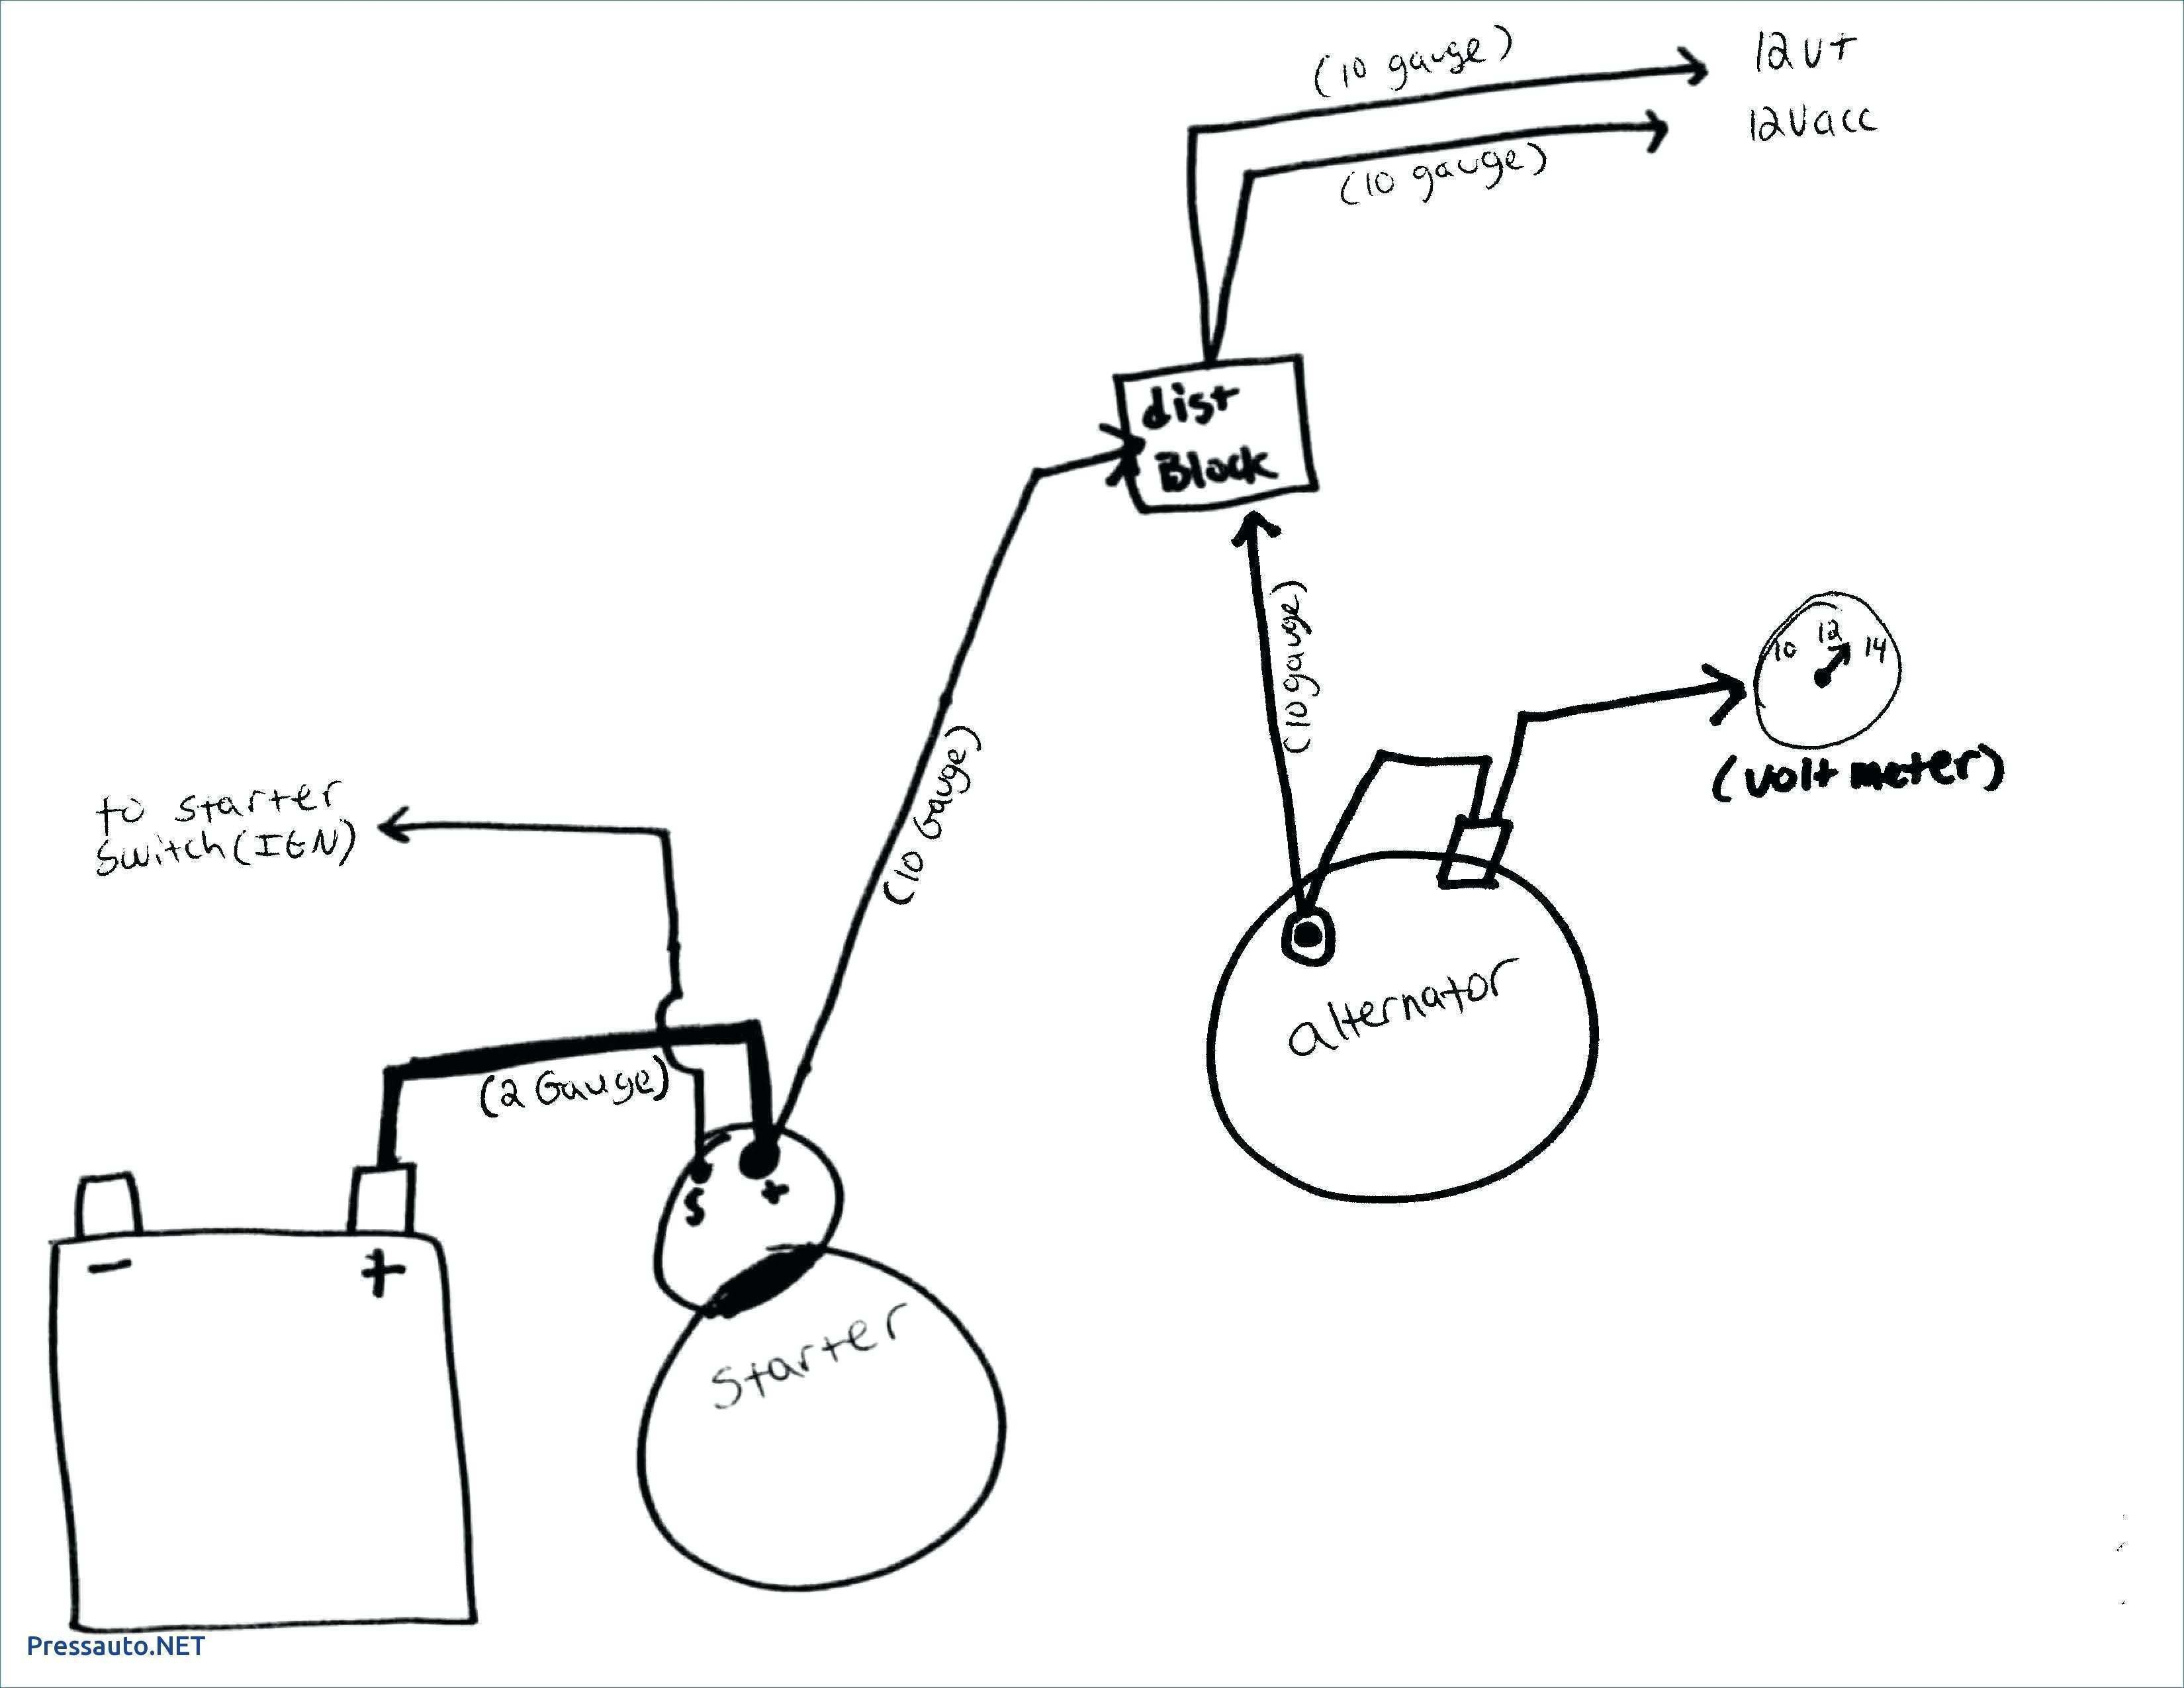 85 Chevy Alternator Wiring - Wiring Diagram Name - Alternator Wiring Diagram Chevy 350